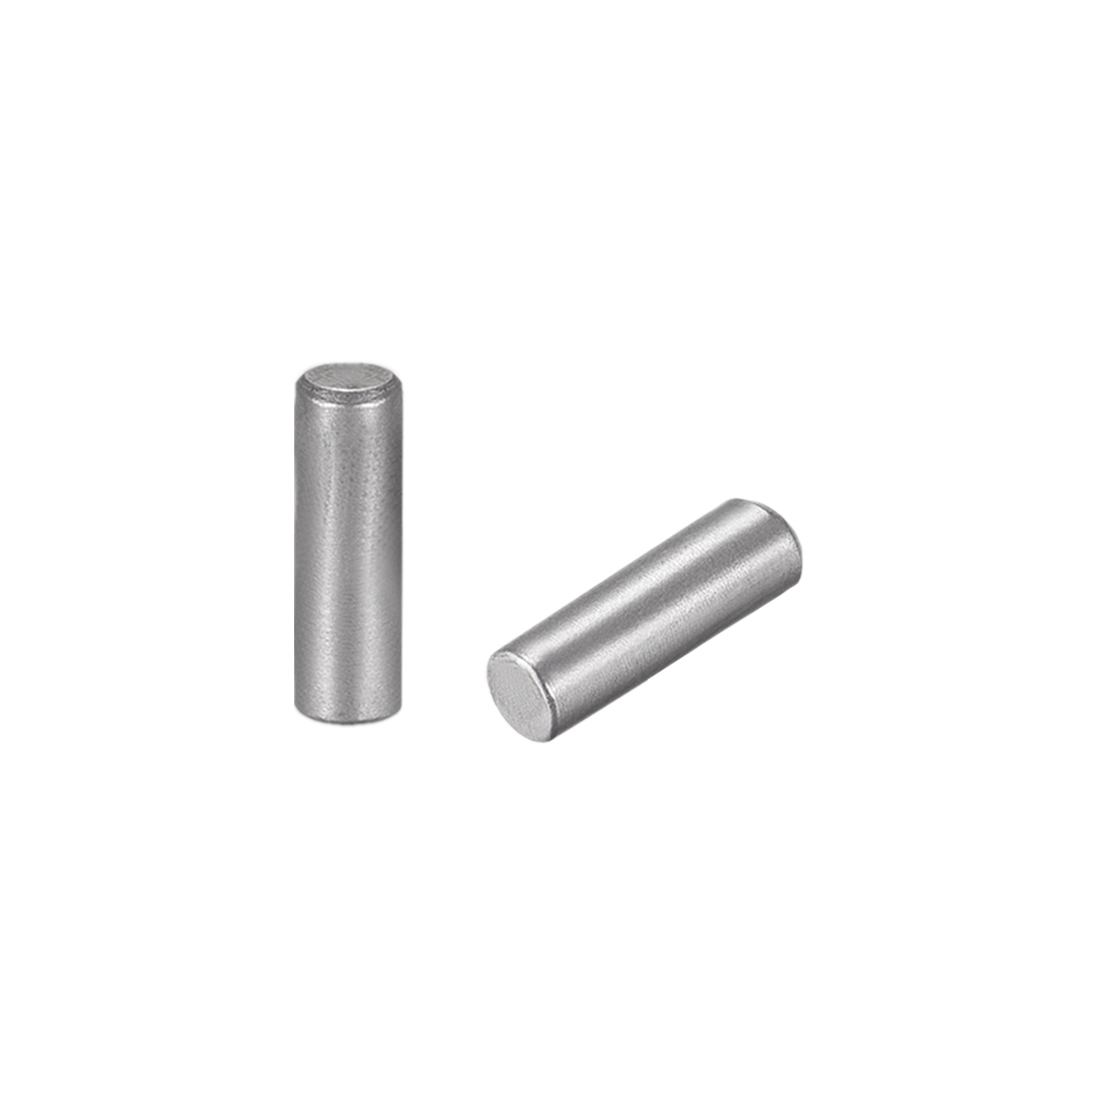 Carbon Steel GB117 20mm Length 6mmx6.4mm Small End Diameter 1:50 Taper Pin 10Pcs